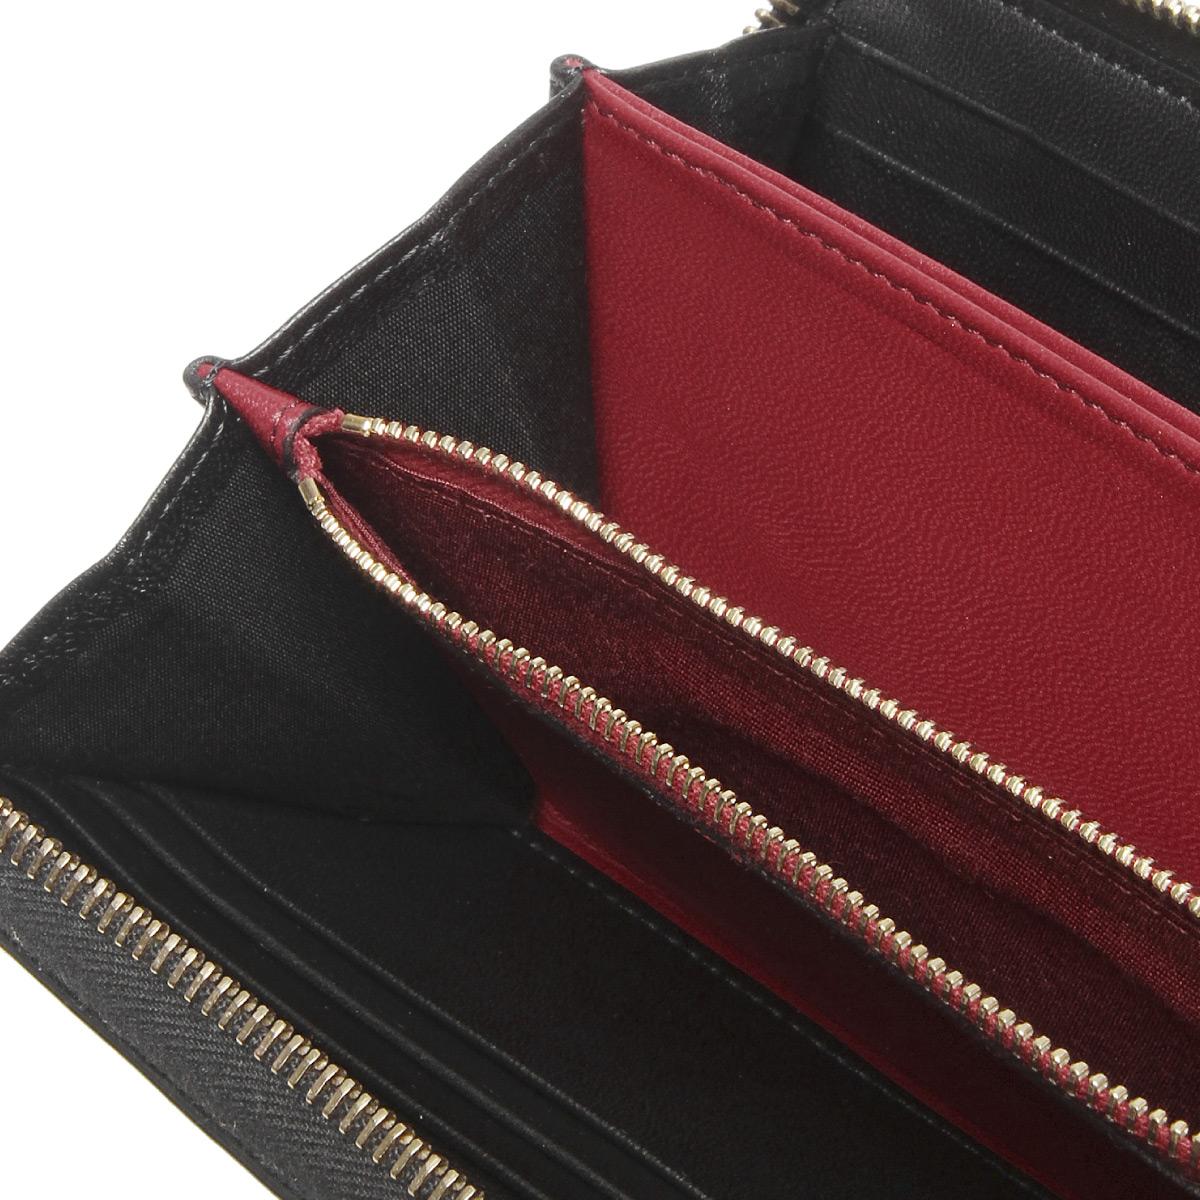 257795d5671b4 ... Valentino VALENTINO wallet Lady's PW2P0P00NAP 0NO round fastener long  wallet ROCKSTUD SPIKE lock stud bolt spikes ...